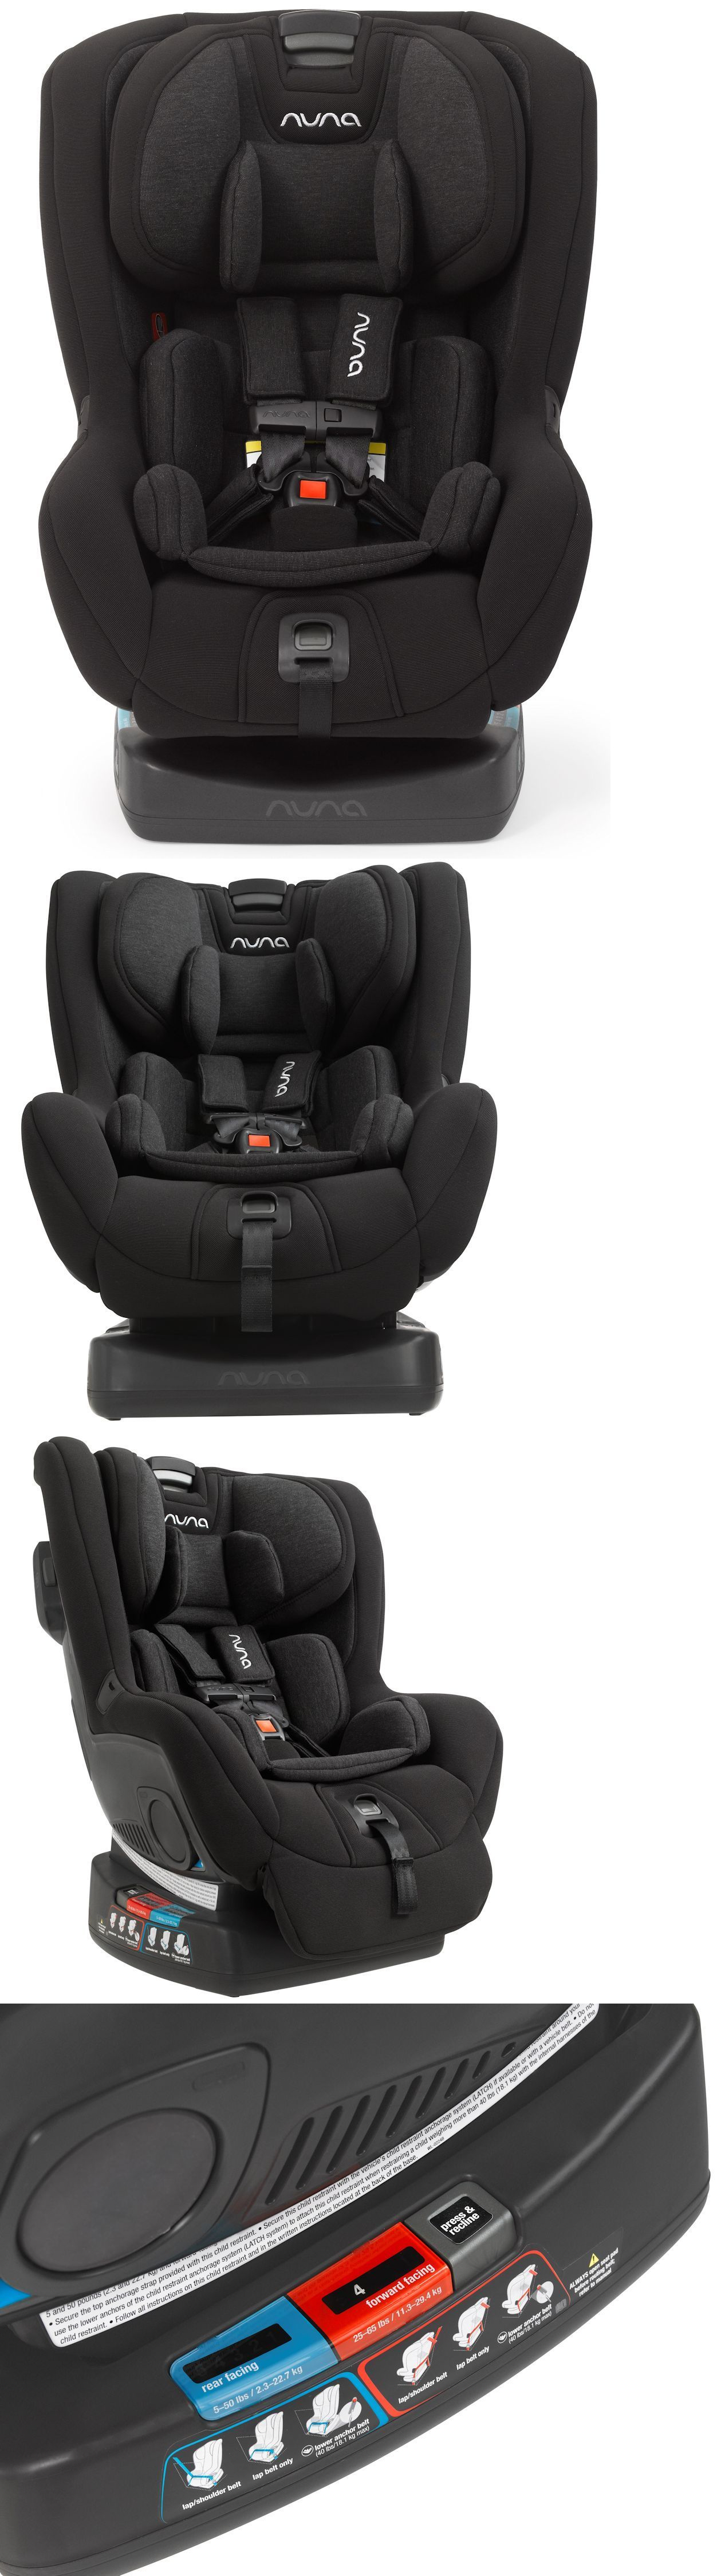 Baby Kid Stuff Nuna Rava Child Safety Convertible Car Seat Caviar New 2016